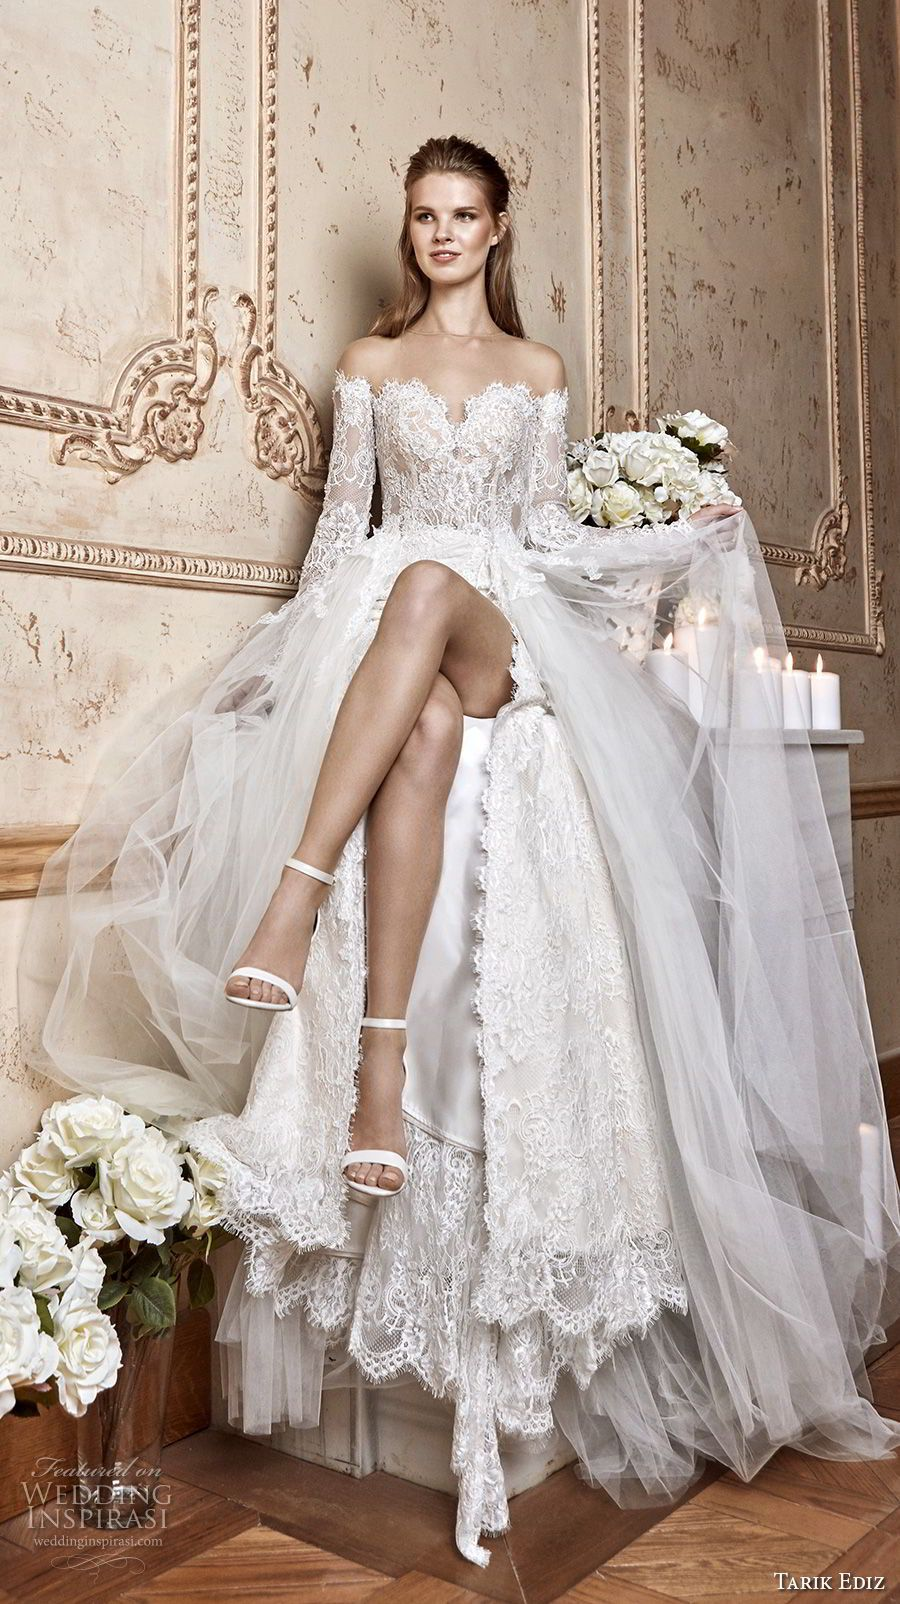 Tarik Ediz 2017 Bridal Off The Shoulder Sweetheart Neckline Heavily Embellished Bodice High Skirt Y A Line Wedding Dress 19 Mv